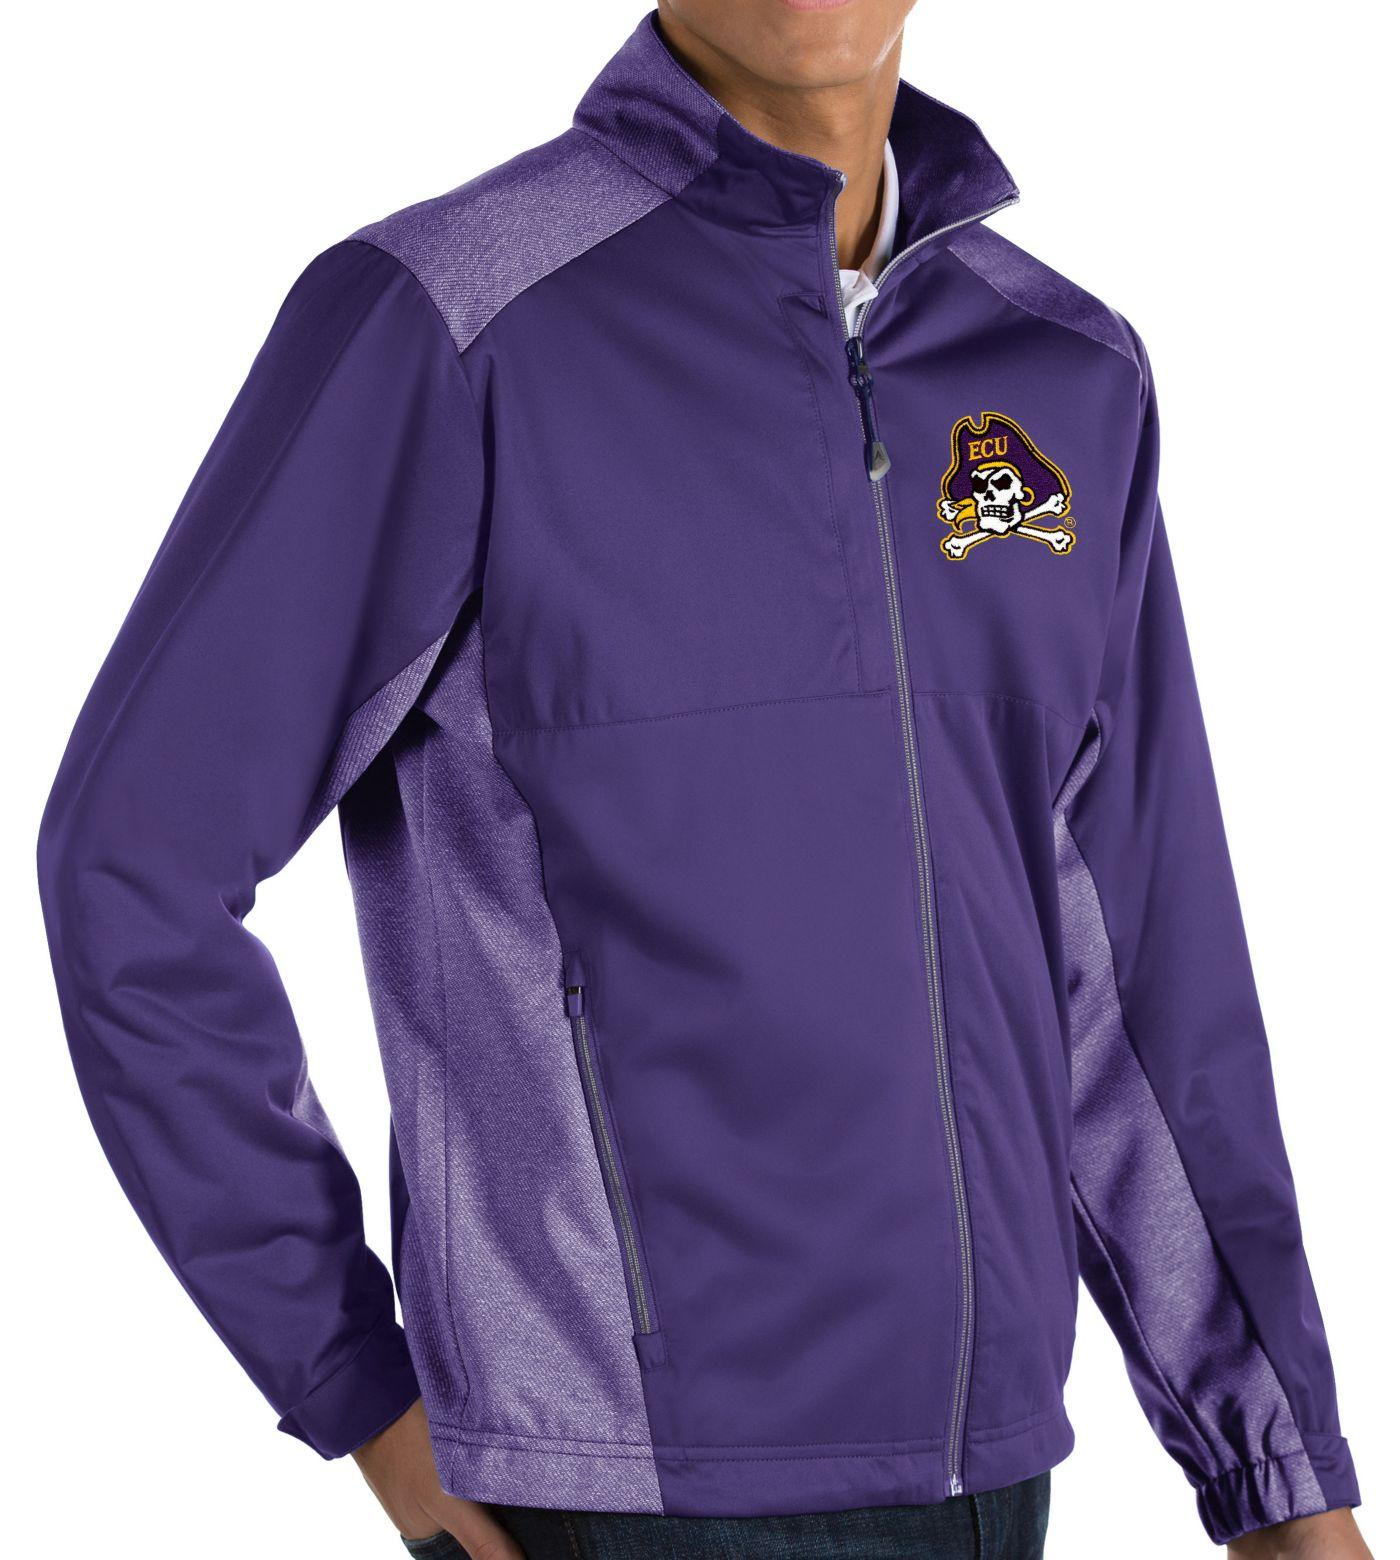 Antigua Men's East Carolina Pirates Purple Revolve Full-Zip Jacket